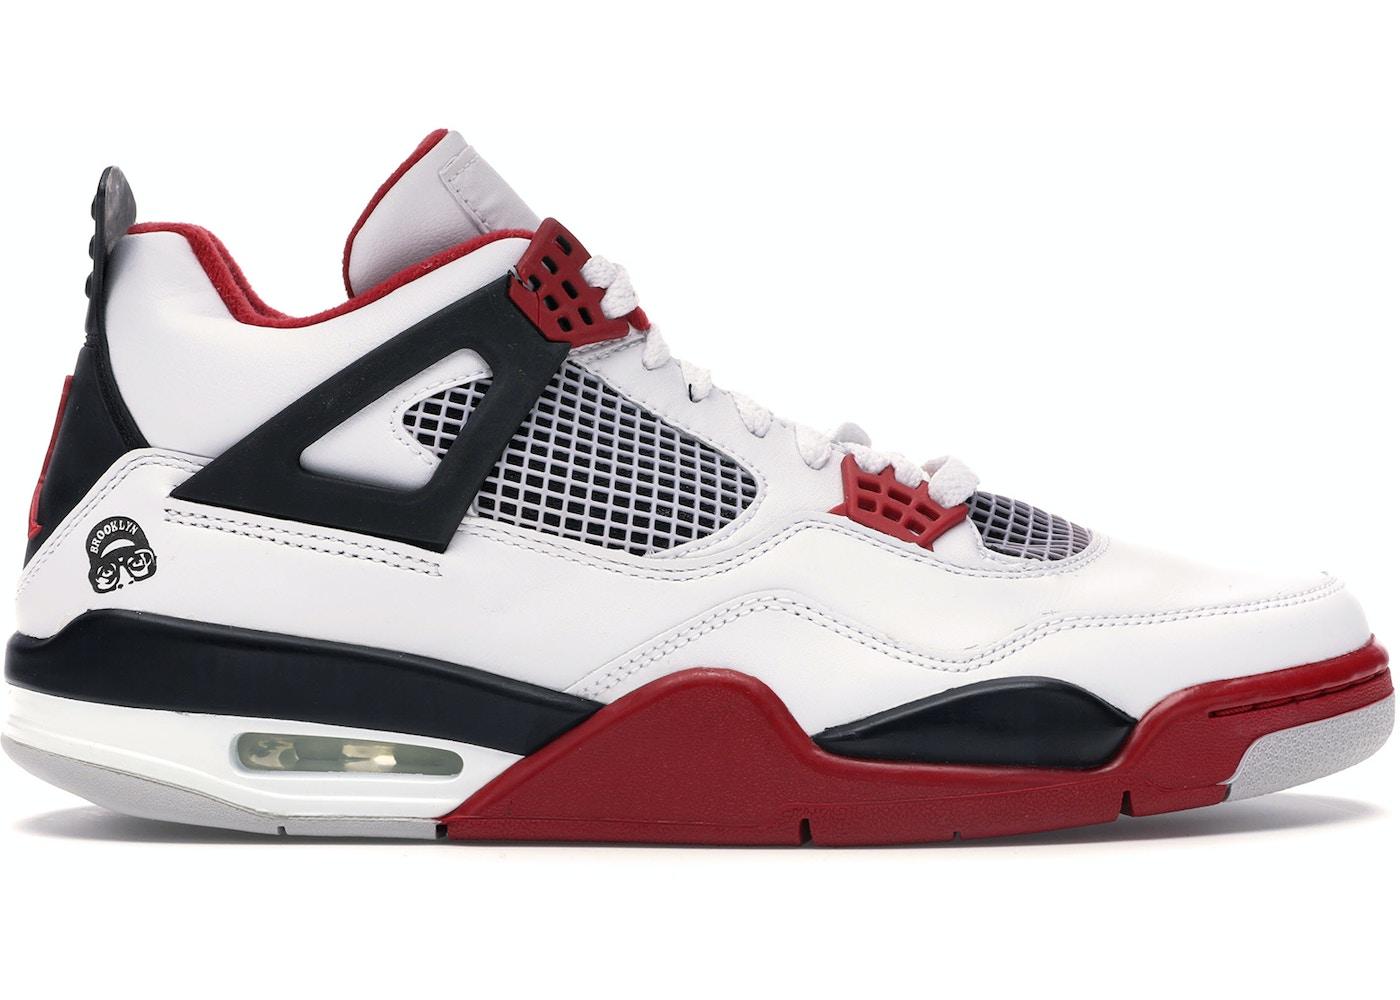 big sale 83ade 2cb77 Buy Air Jordan 4 Size 15 Shoes   Deadstock Sneakers